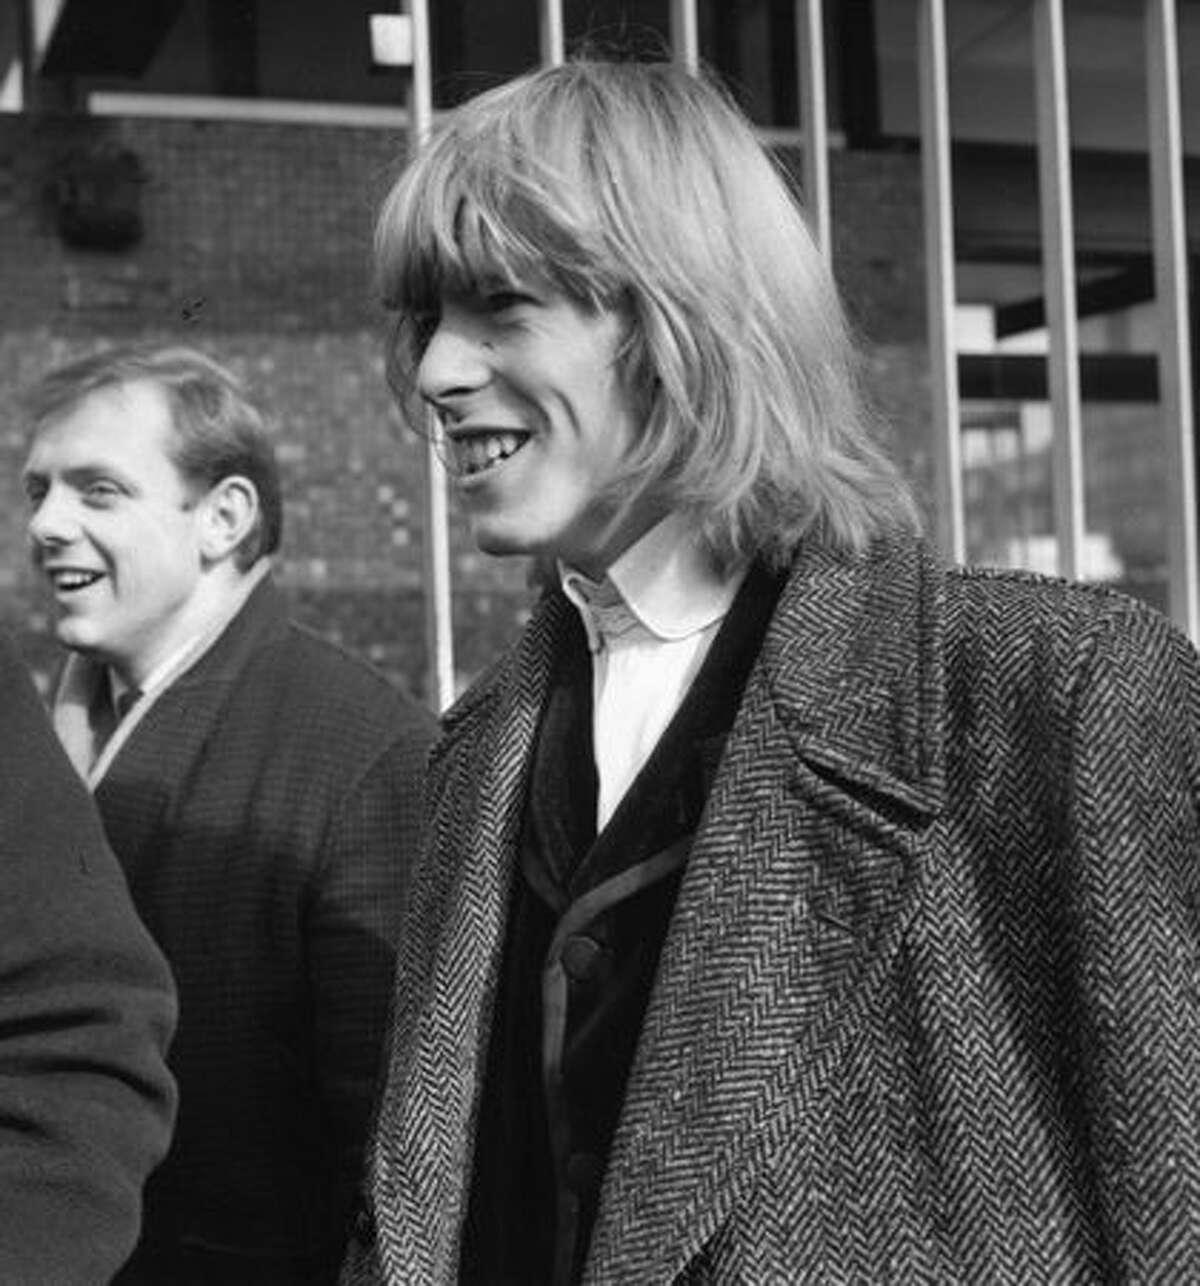 Pop singer David Jones, later to find fame as David Bowie.